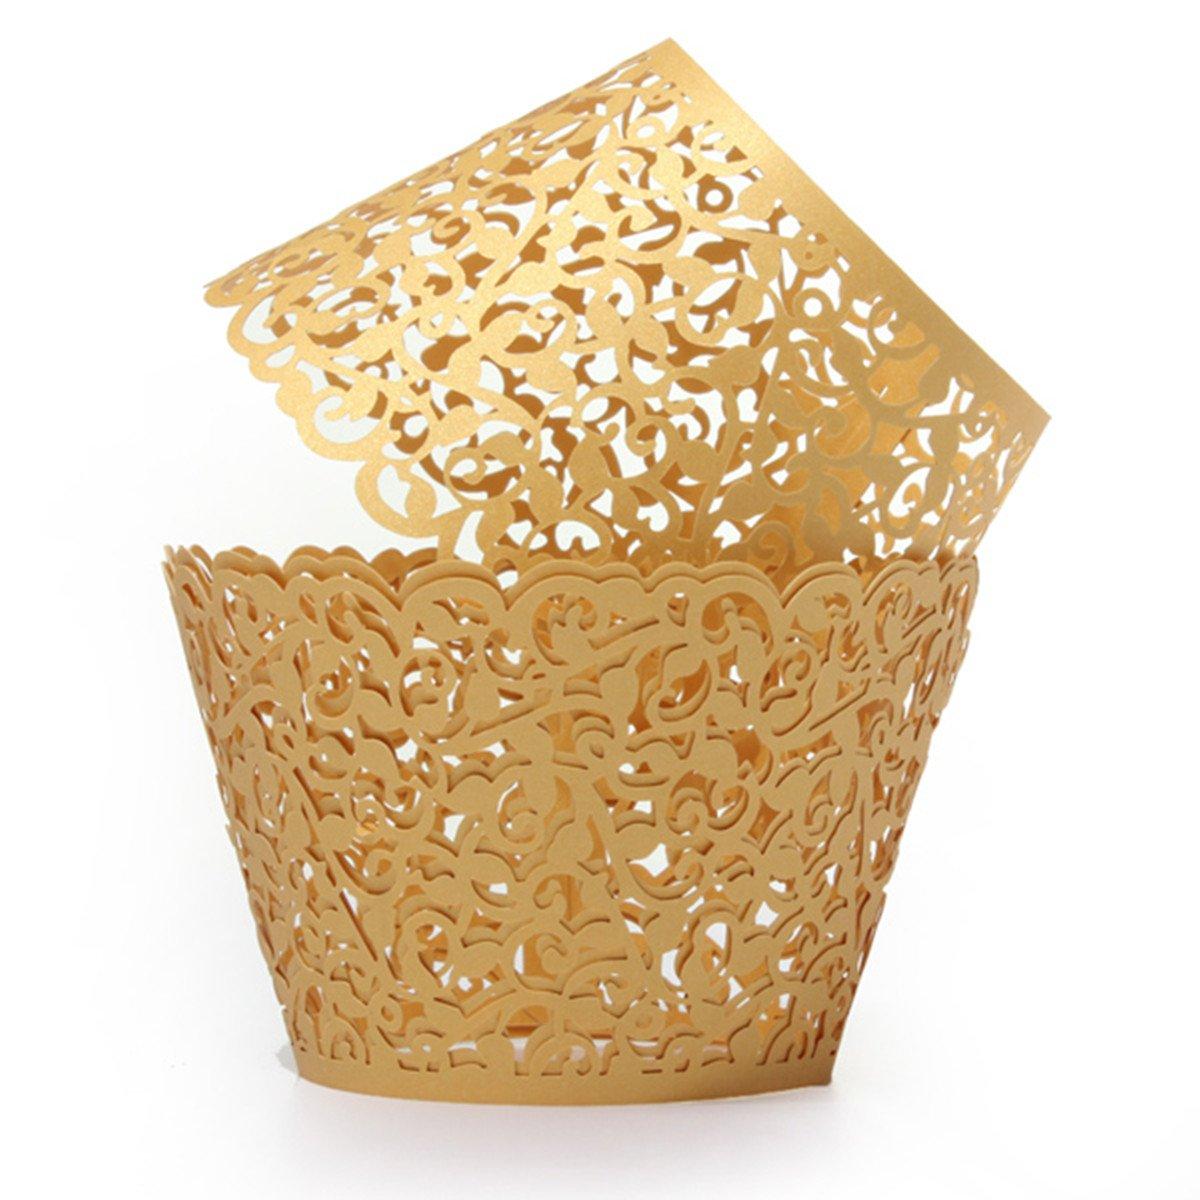 12X Filigree Vine Cake Cupcake Wrappers Wraps Cases Wedding Birthday ...